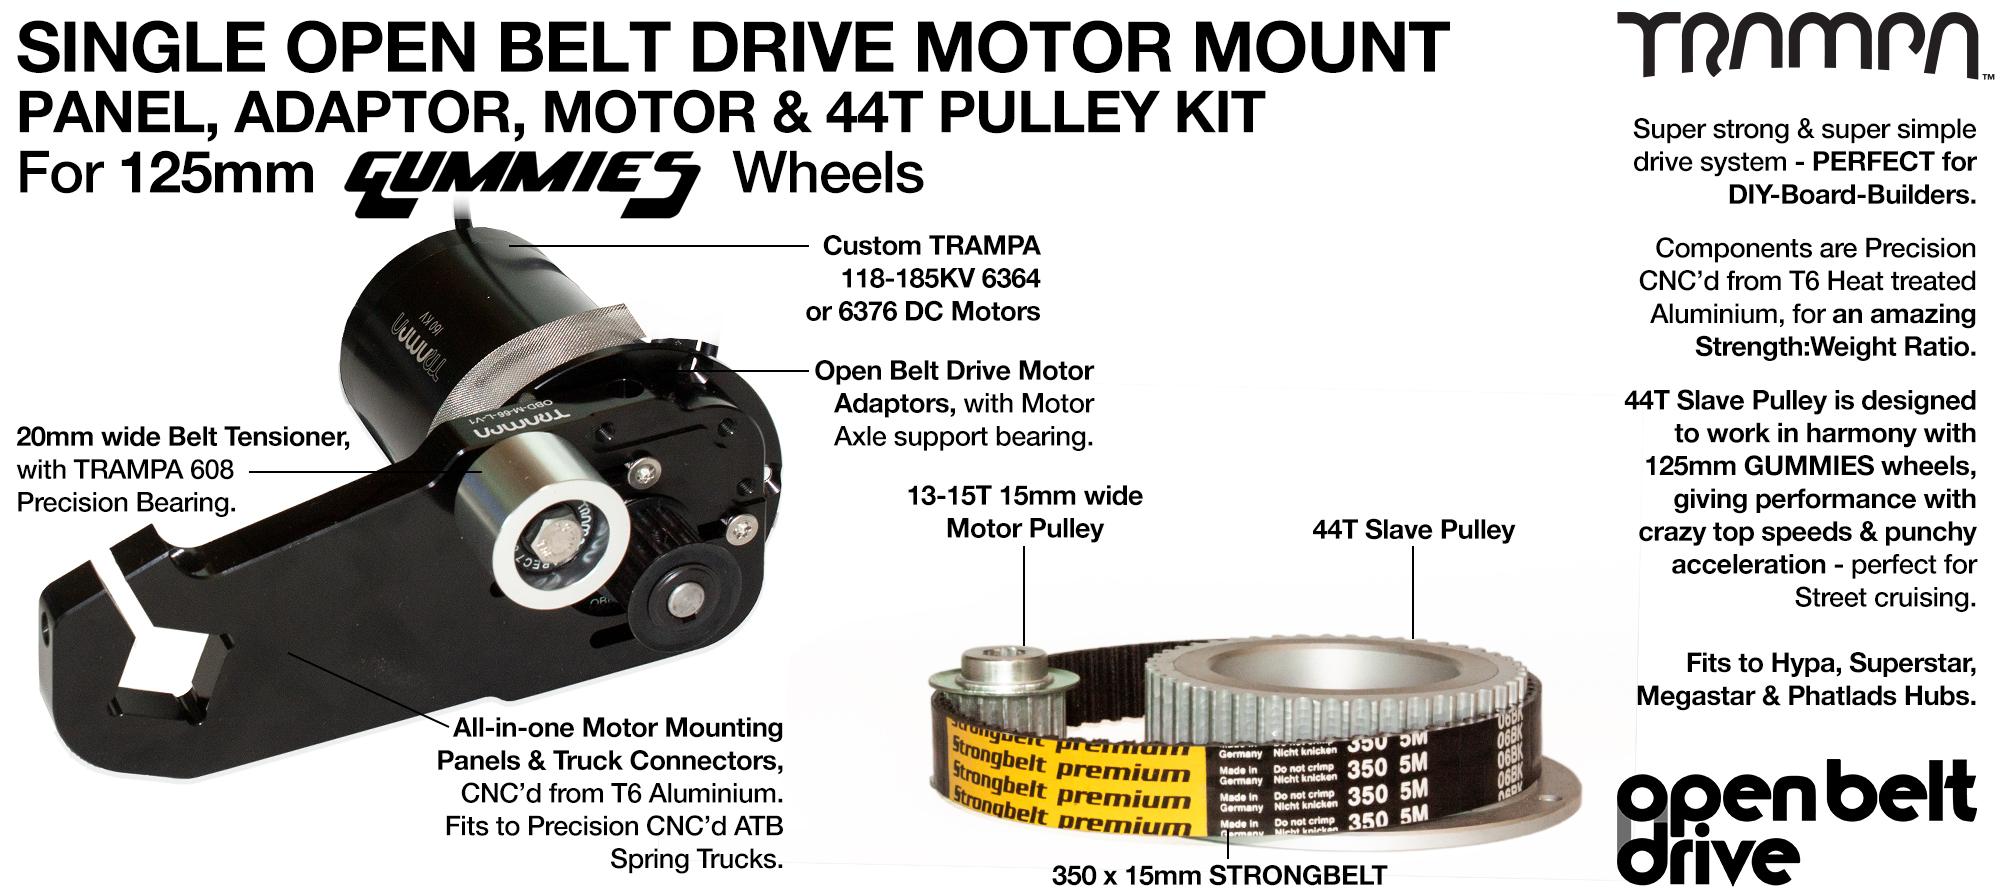 66T OBD Motor Mount with 44T Pulley kit & custom Motor - SINGLE